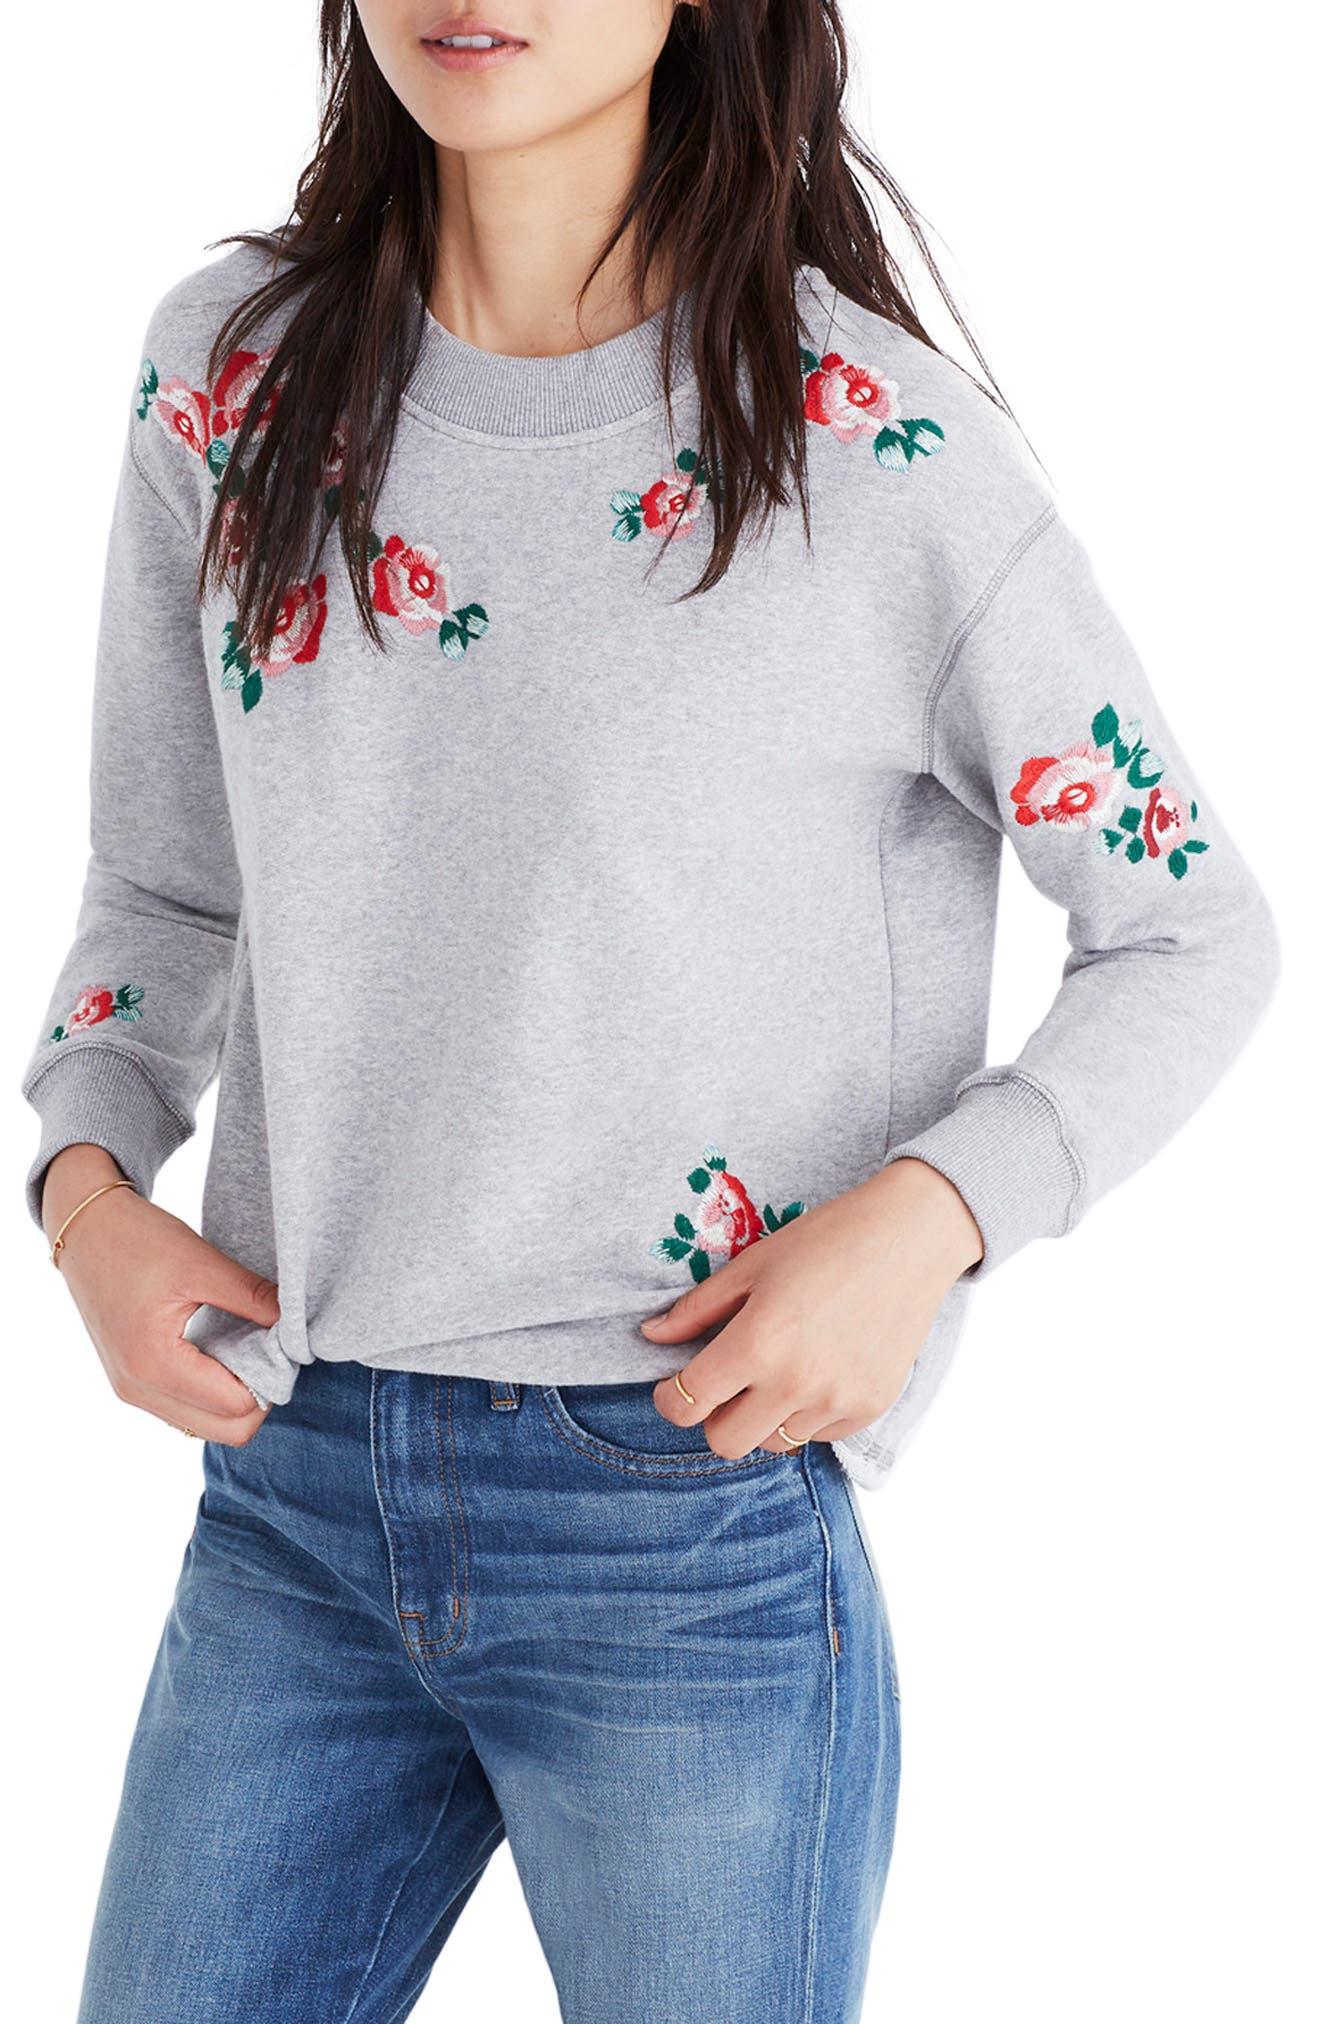 Embroidered Crop Sweatshirt,                         Main,                         color, 020